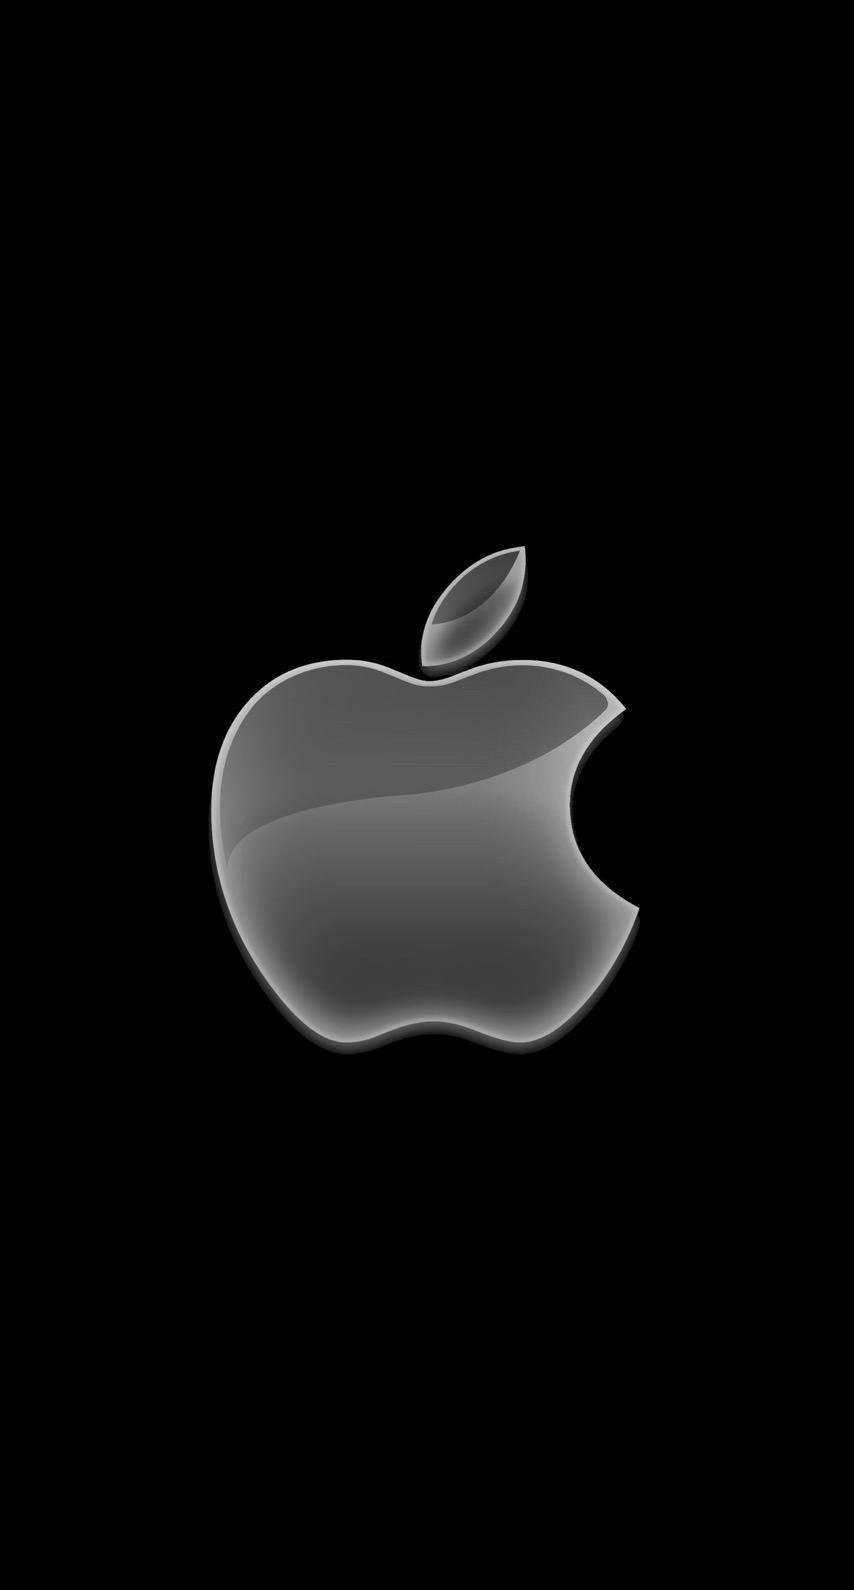 Iphone Black Logo Wallpaper Hd 854x1590